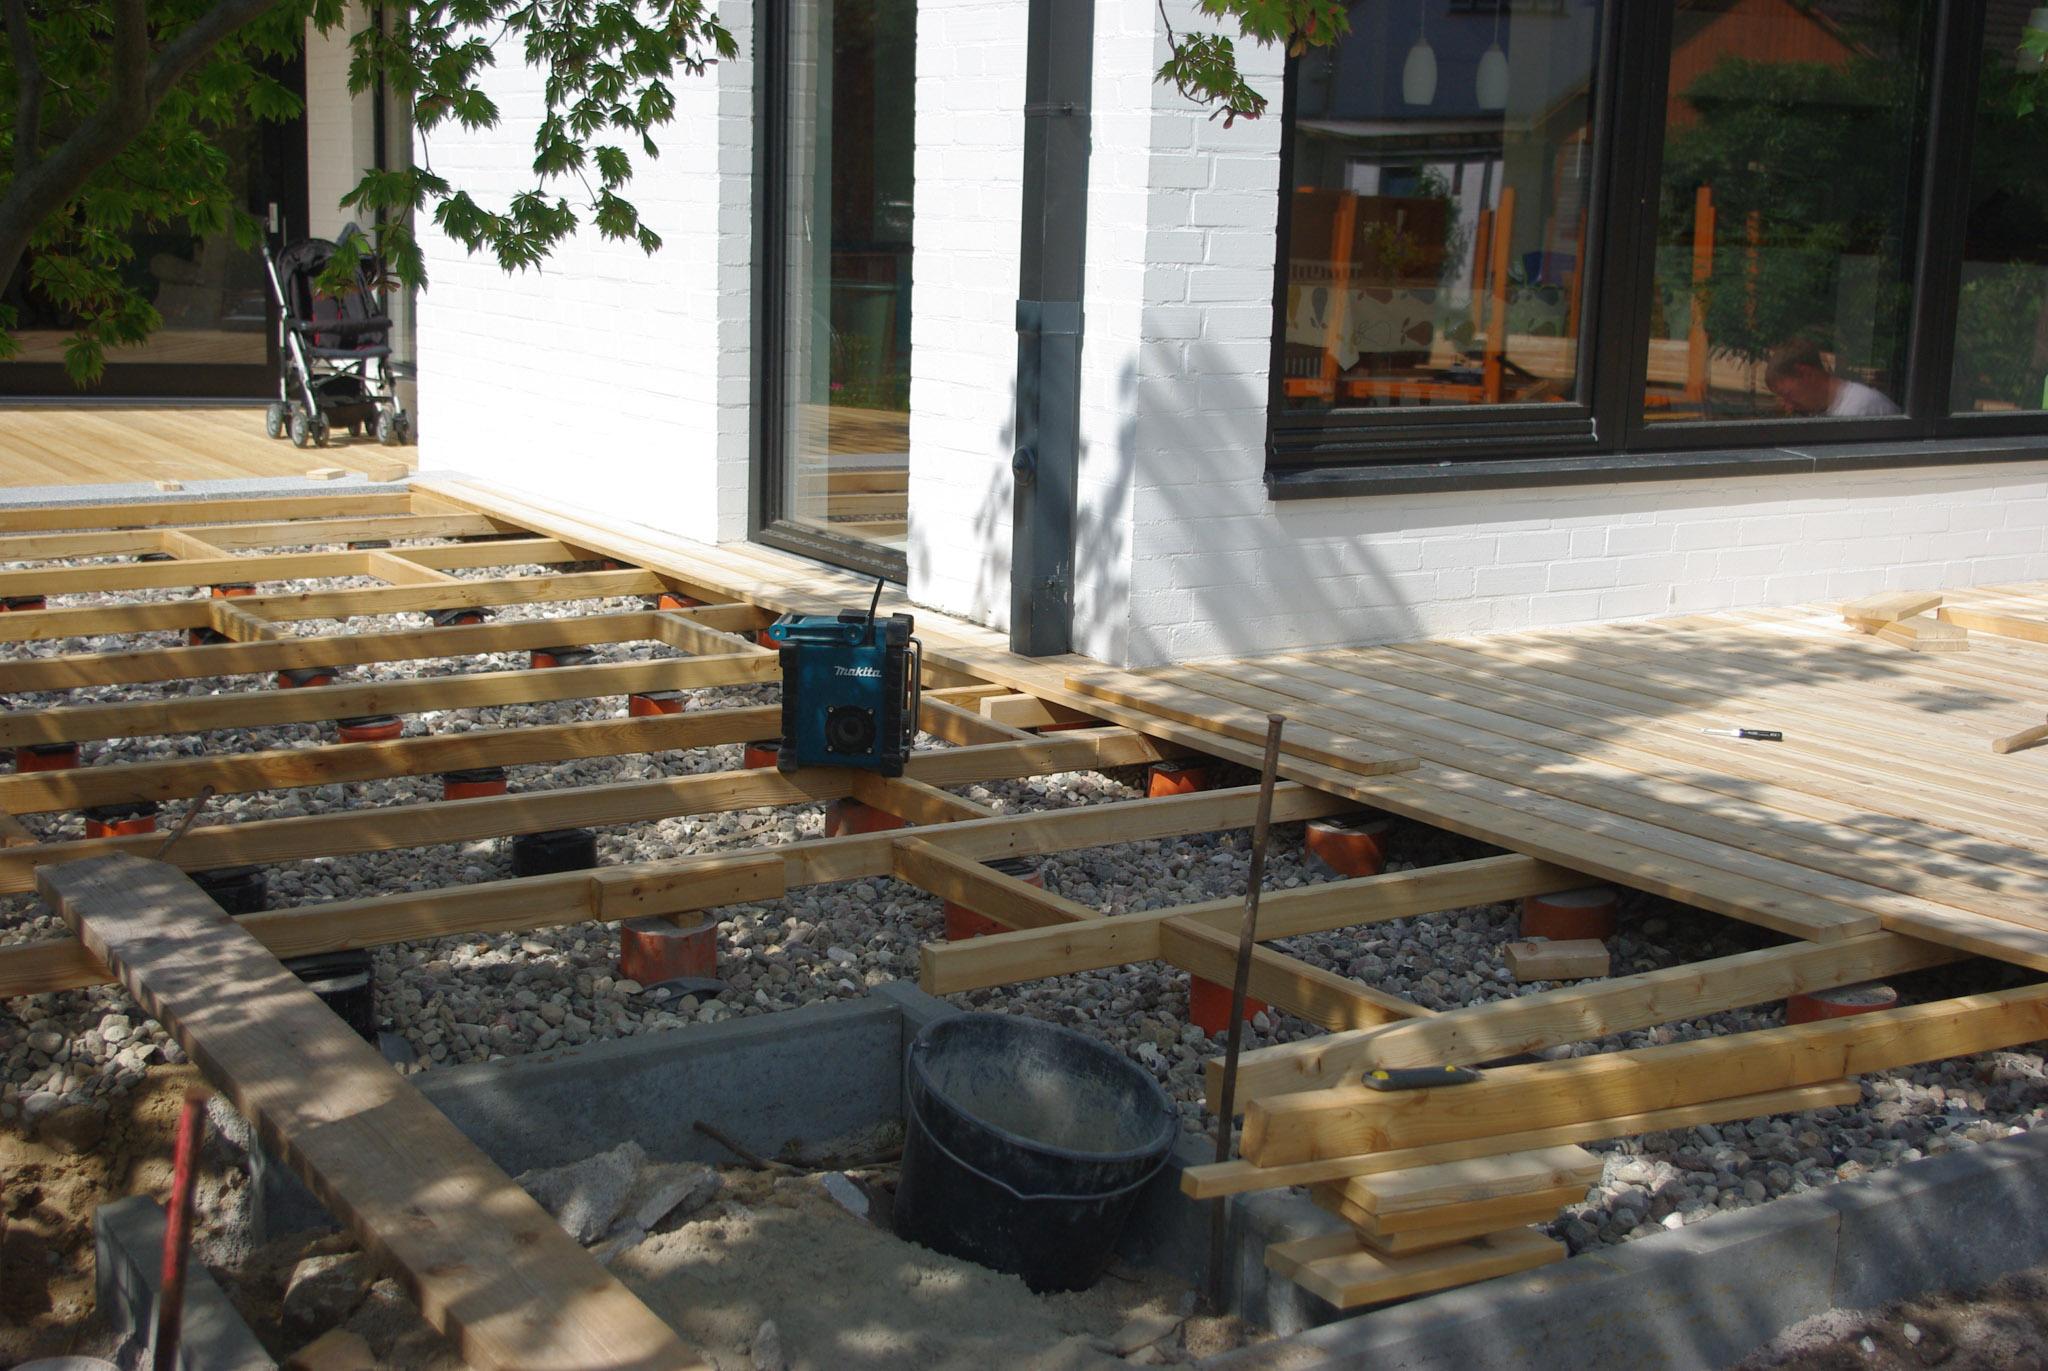 Holzterrasse-Schritt-5